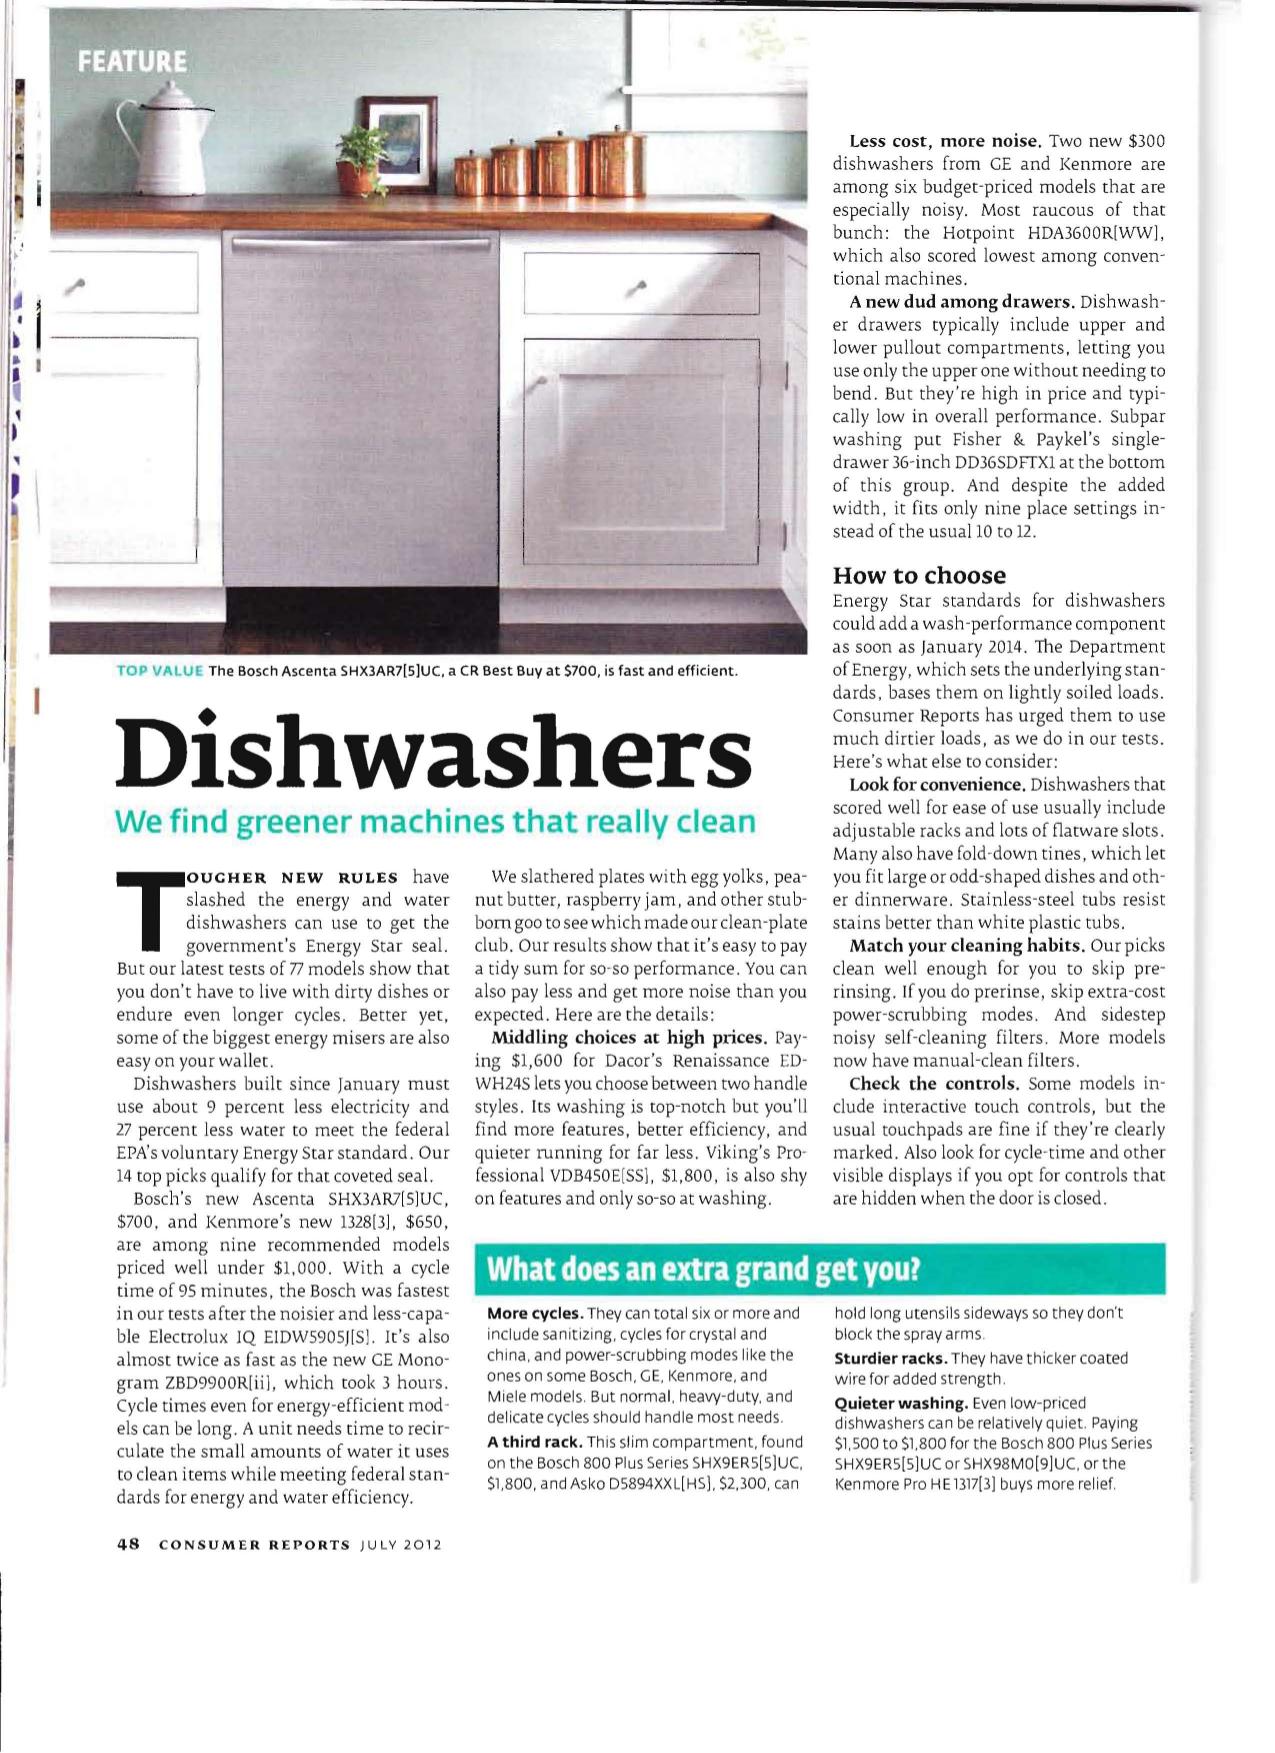 ... Kitchenaid Dishwasher Consumer Reports